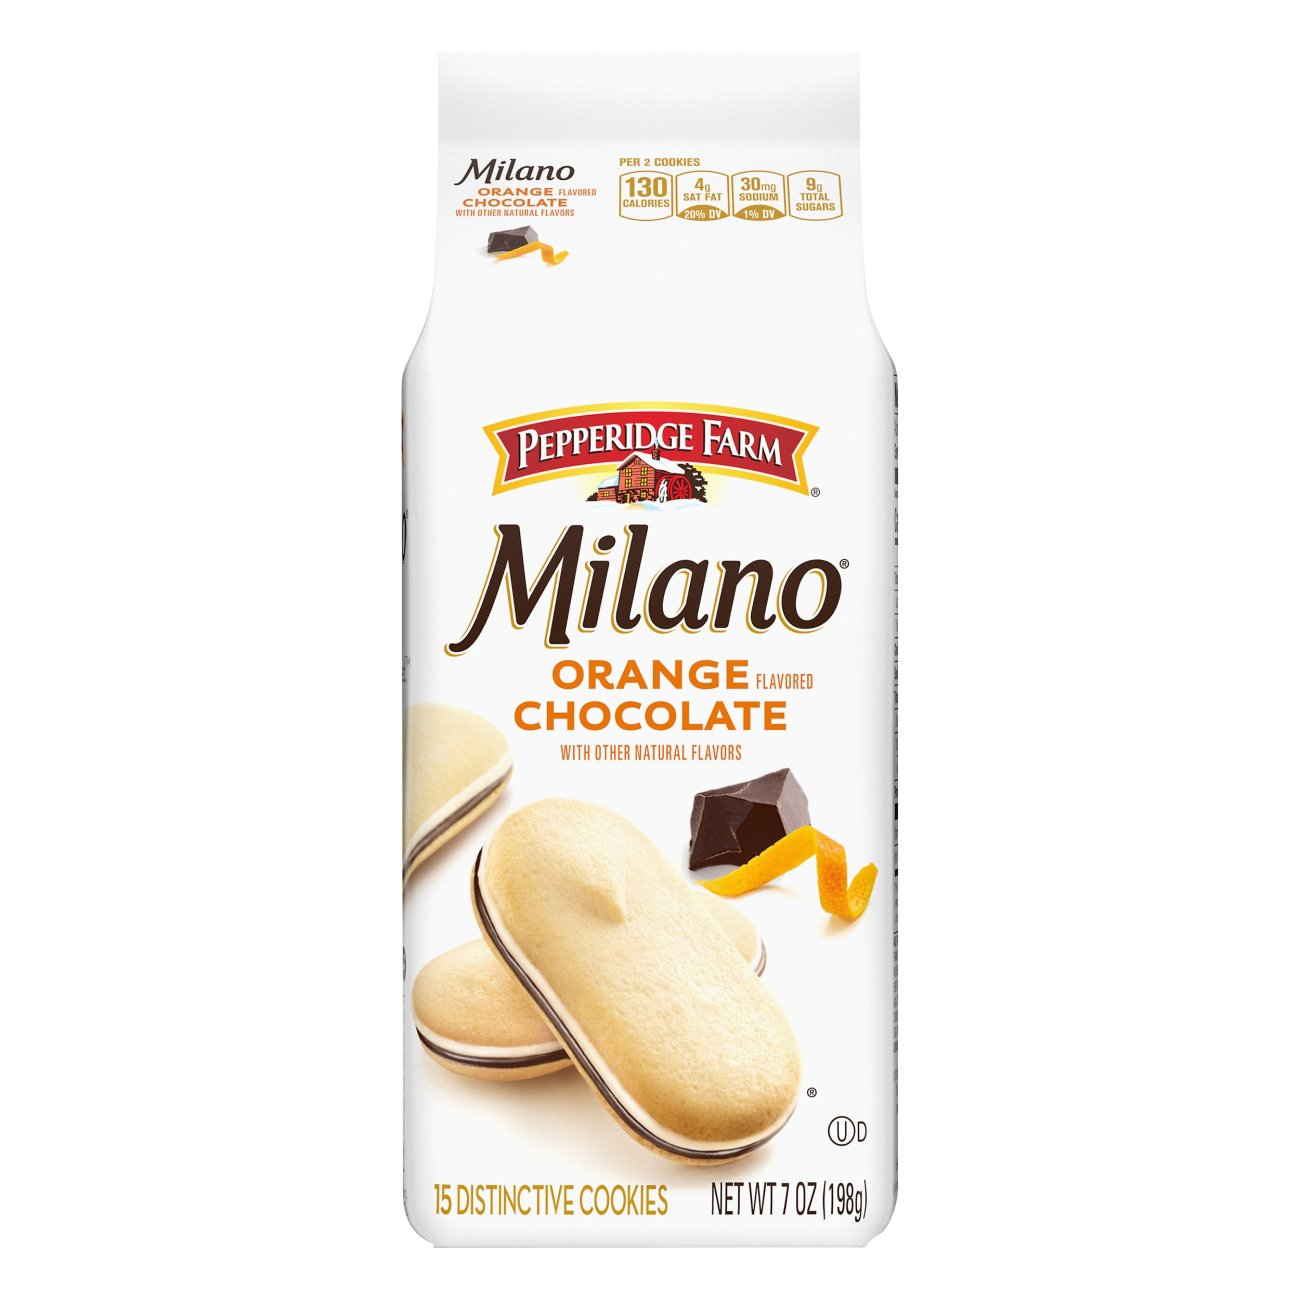 PEPPERIDGE FARM - MILANO ORANGE CHOCOLATE